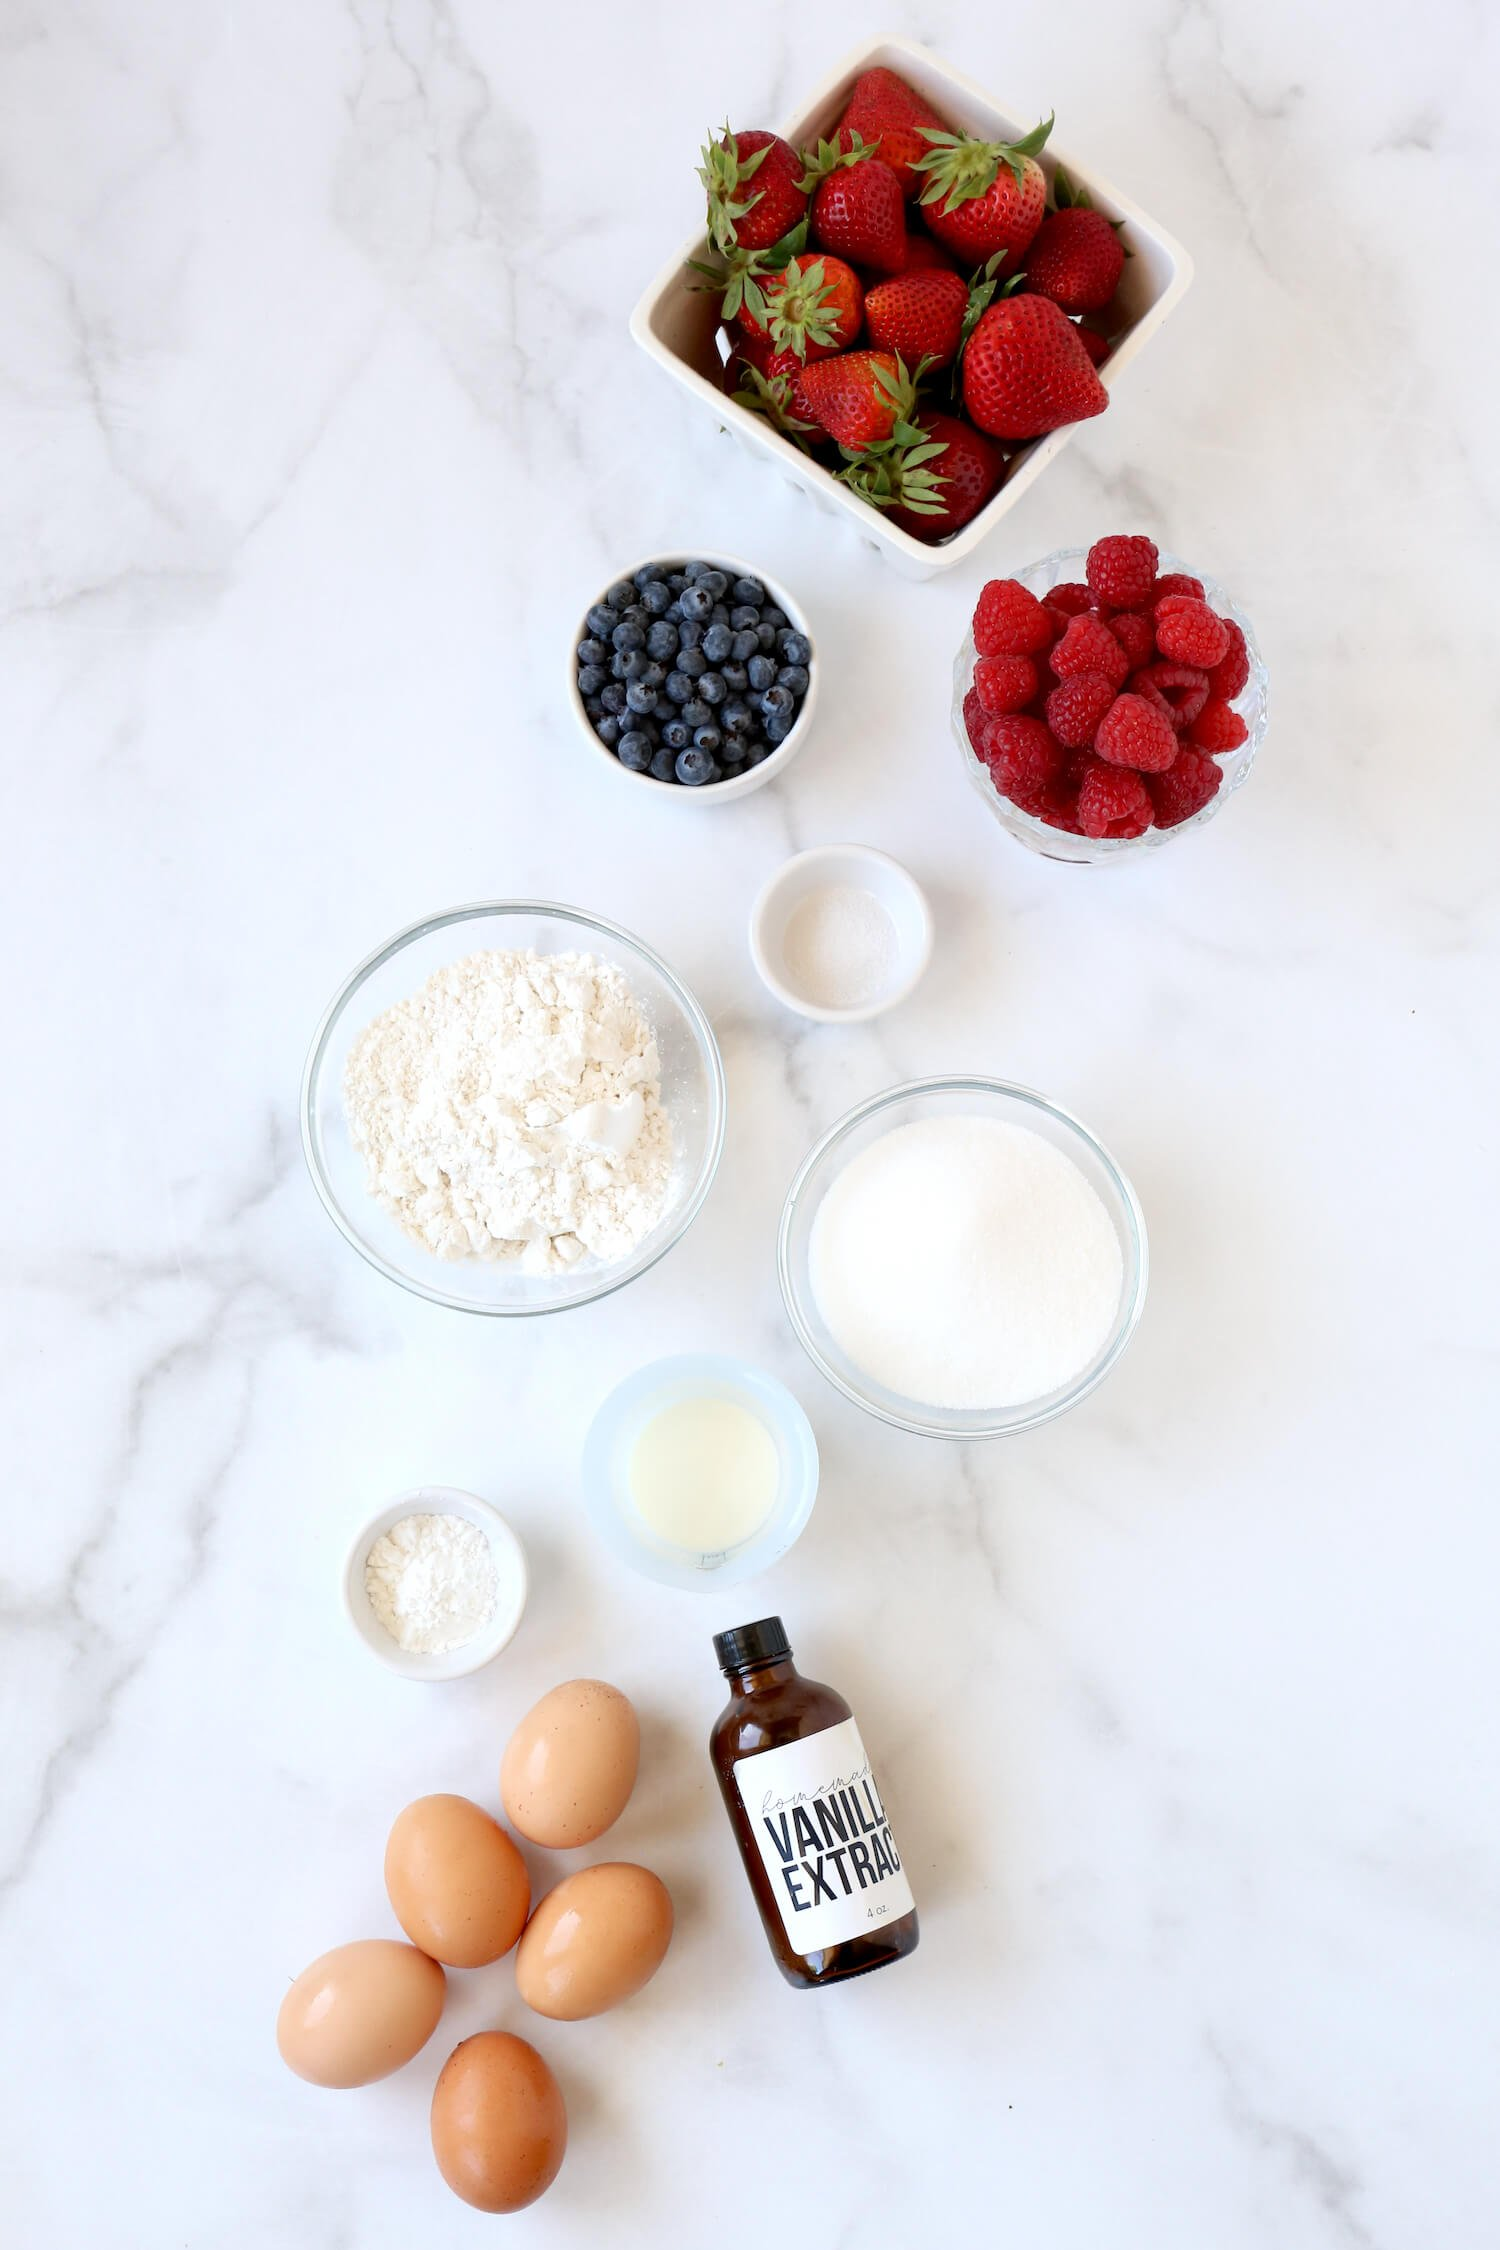 Bowls of strawberries, raspberries, blueberries, flour, sugar, vanilla extract, salt and eggs.